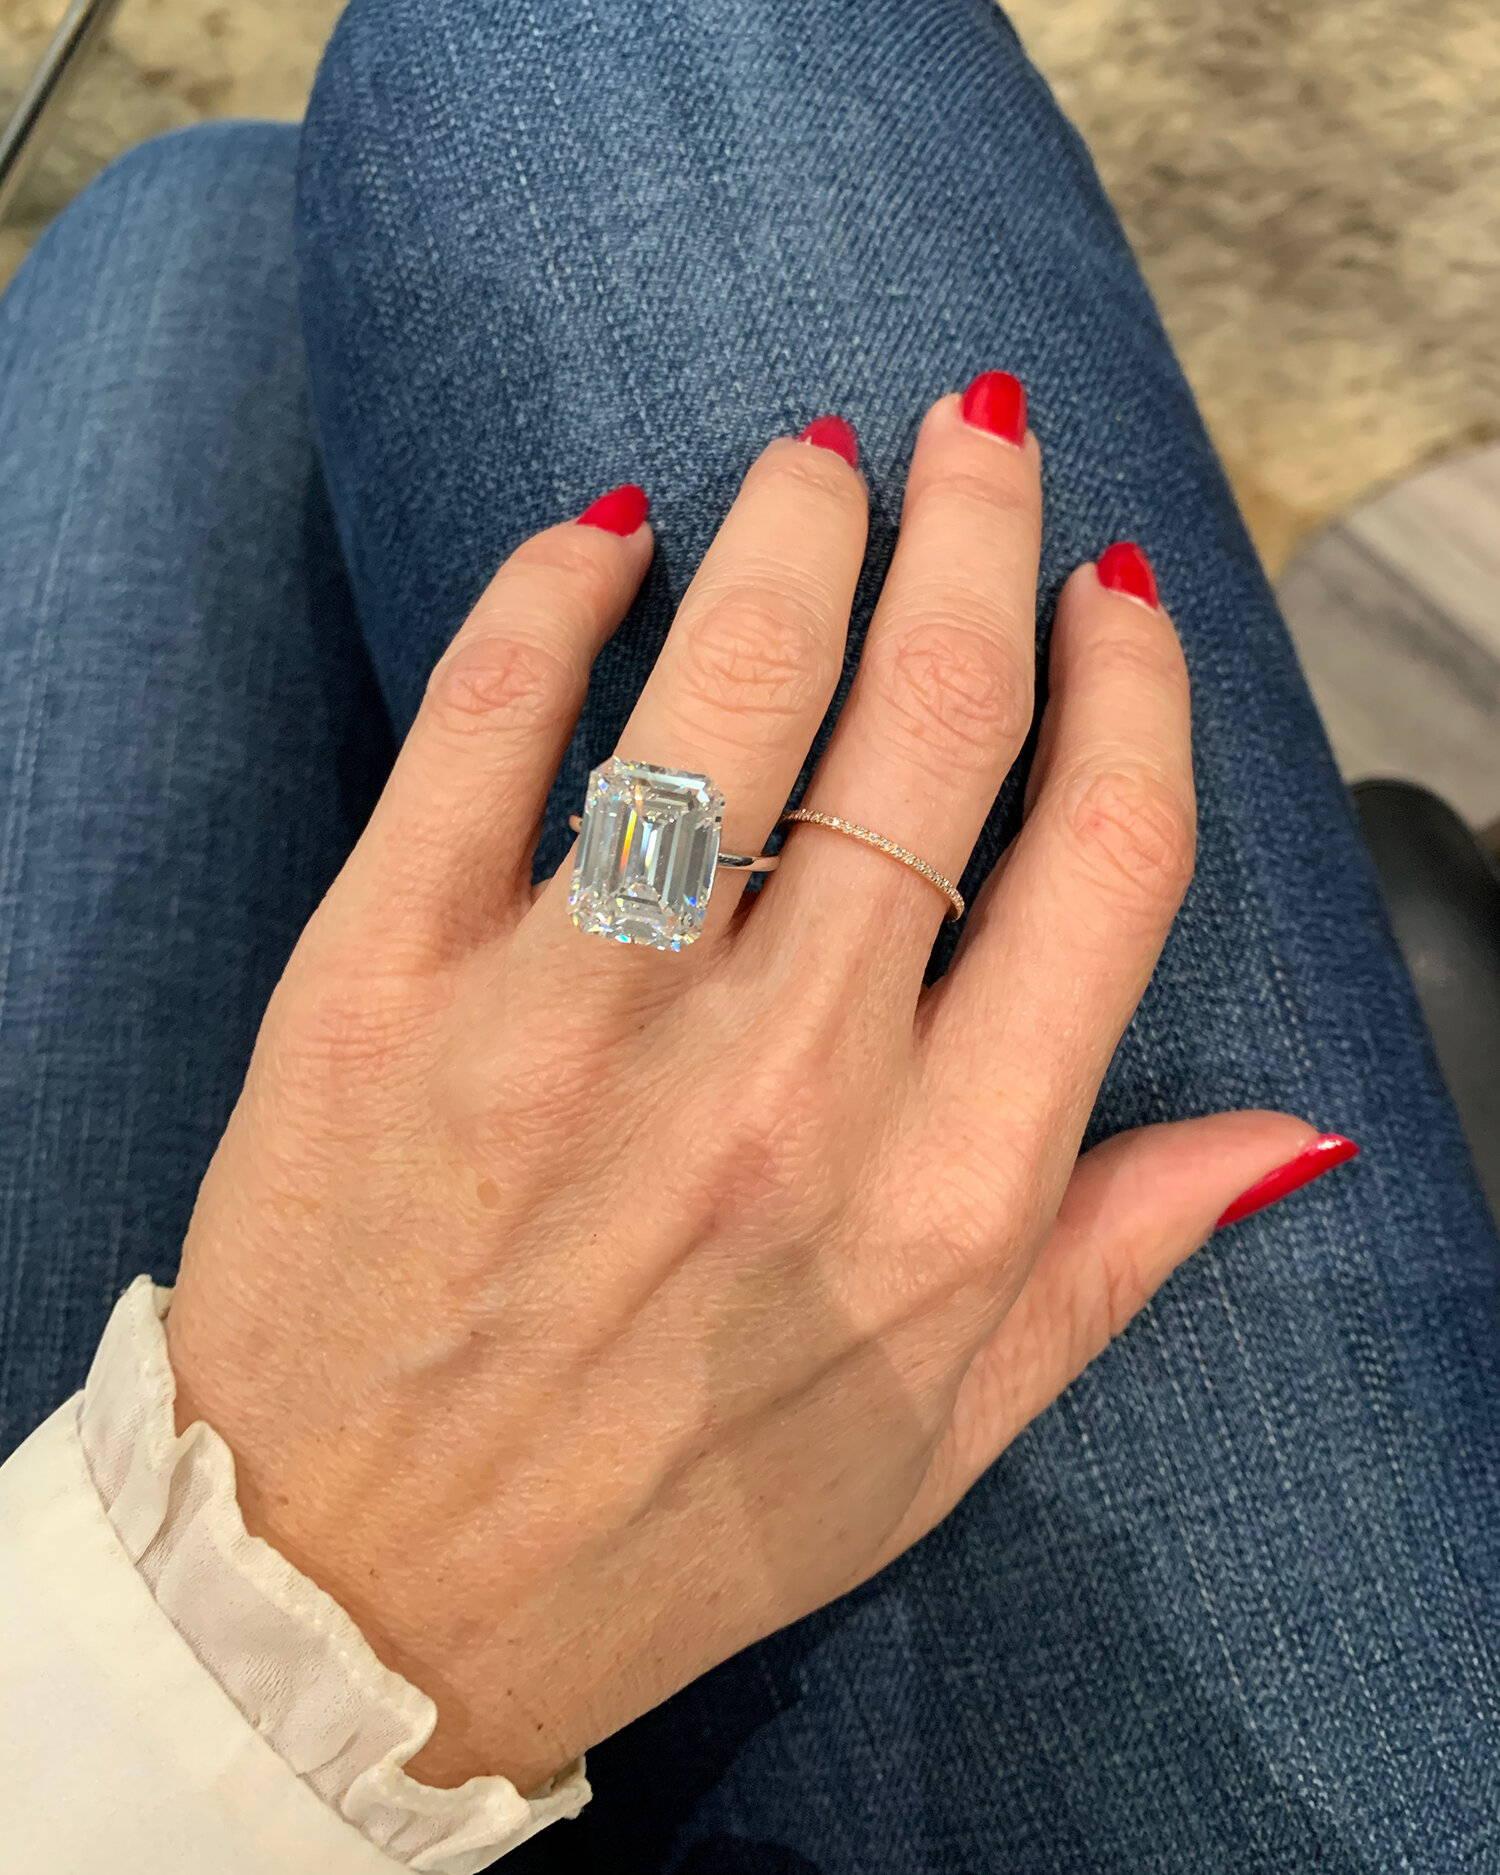 Miss Diamond Ring 7 Carat 8 Carat Emerald Diamond Engagement Ring